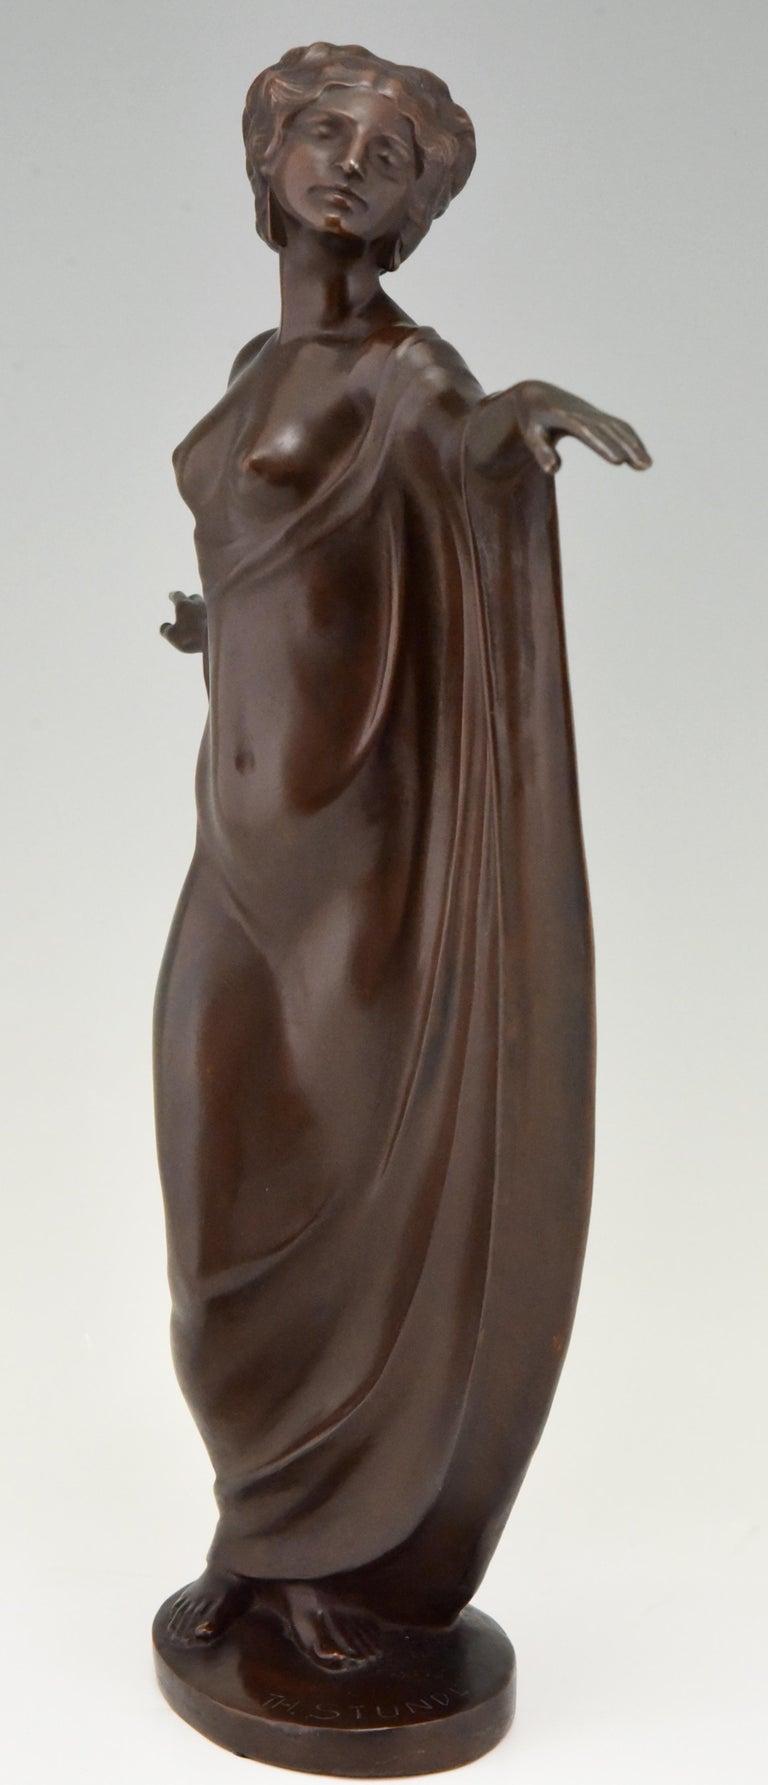 Austrian Art Nouveau Vienna Bronze Sculpture Draped Nude Dancer Theodor Stundl, 1910 For Sale